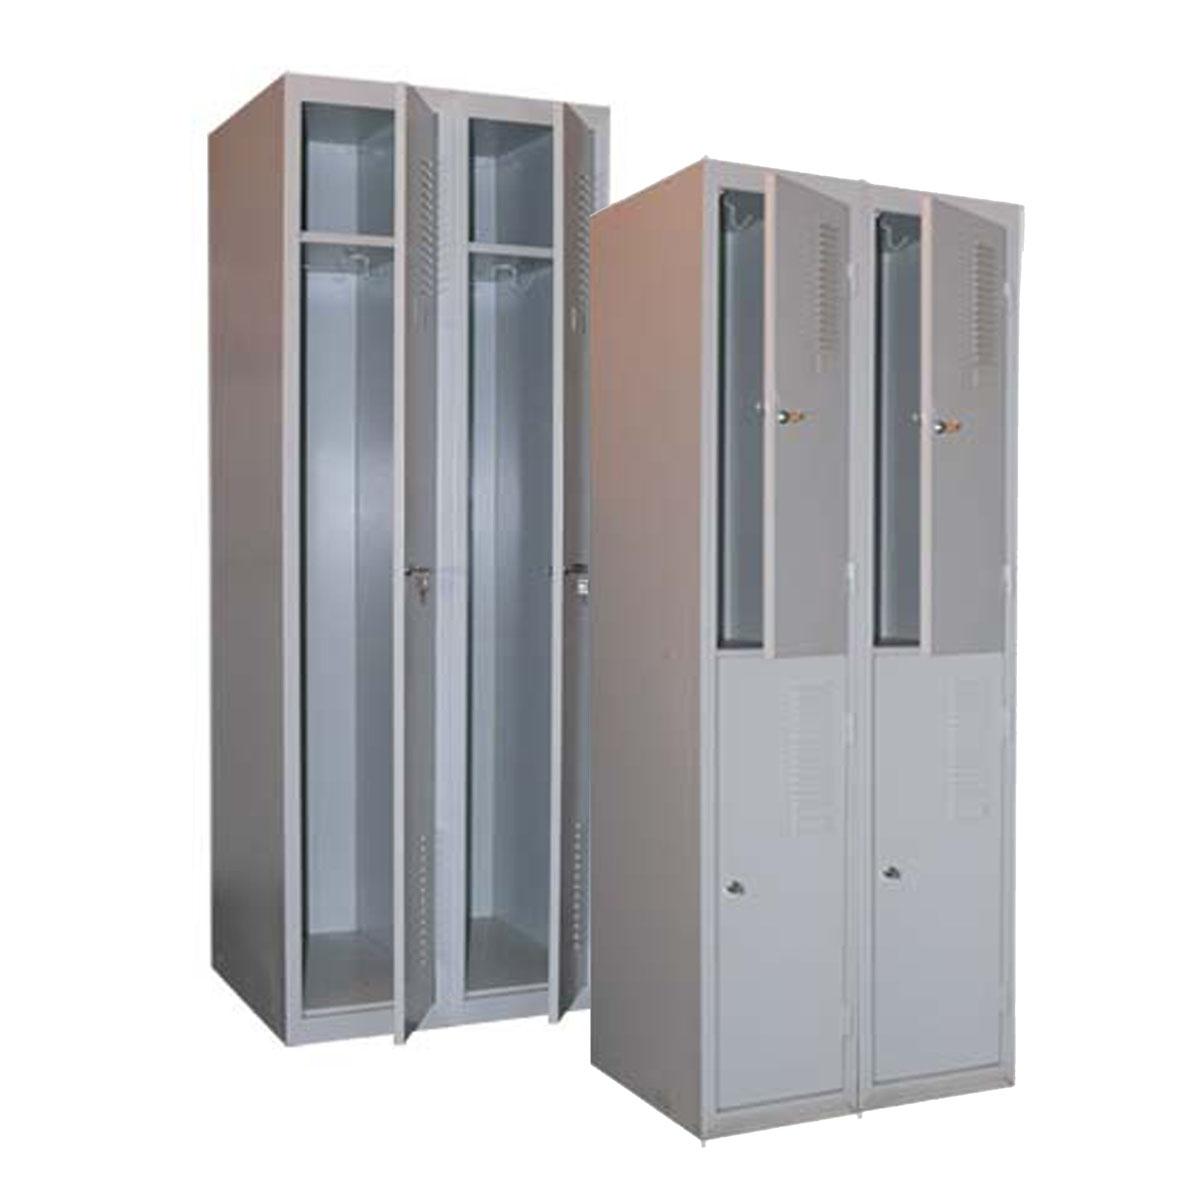 шкафы для раздевалок, шкафы гардеробные, шкафы для одежды, шкафы для спецодежды